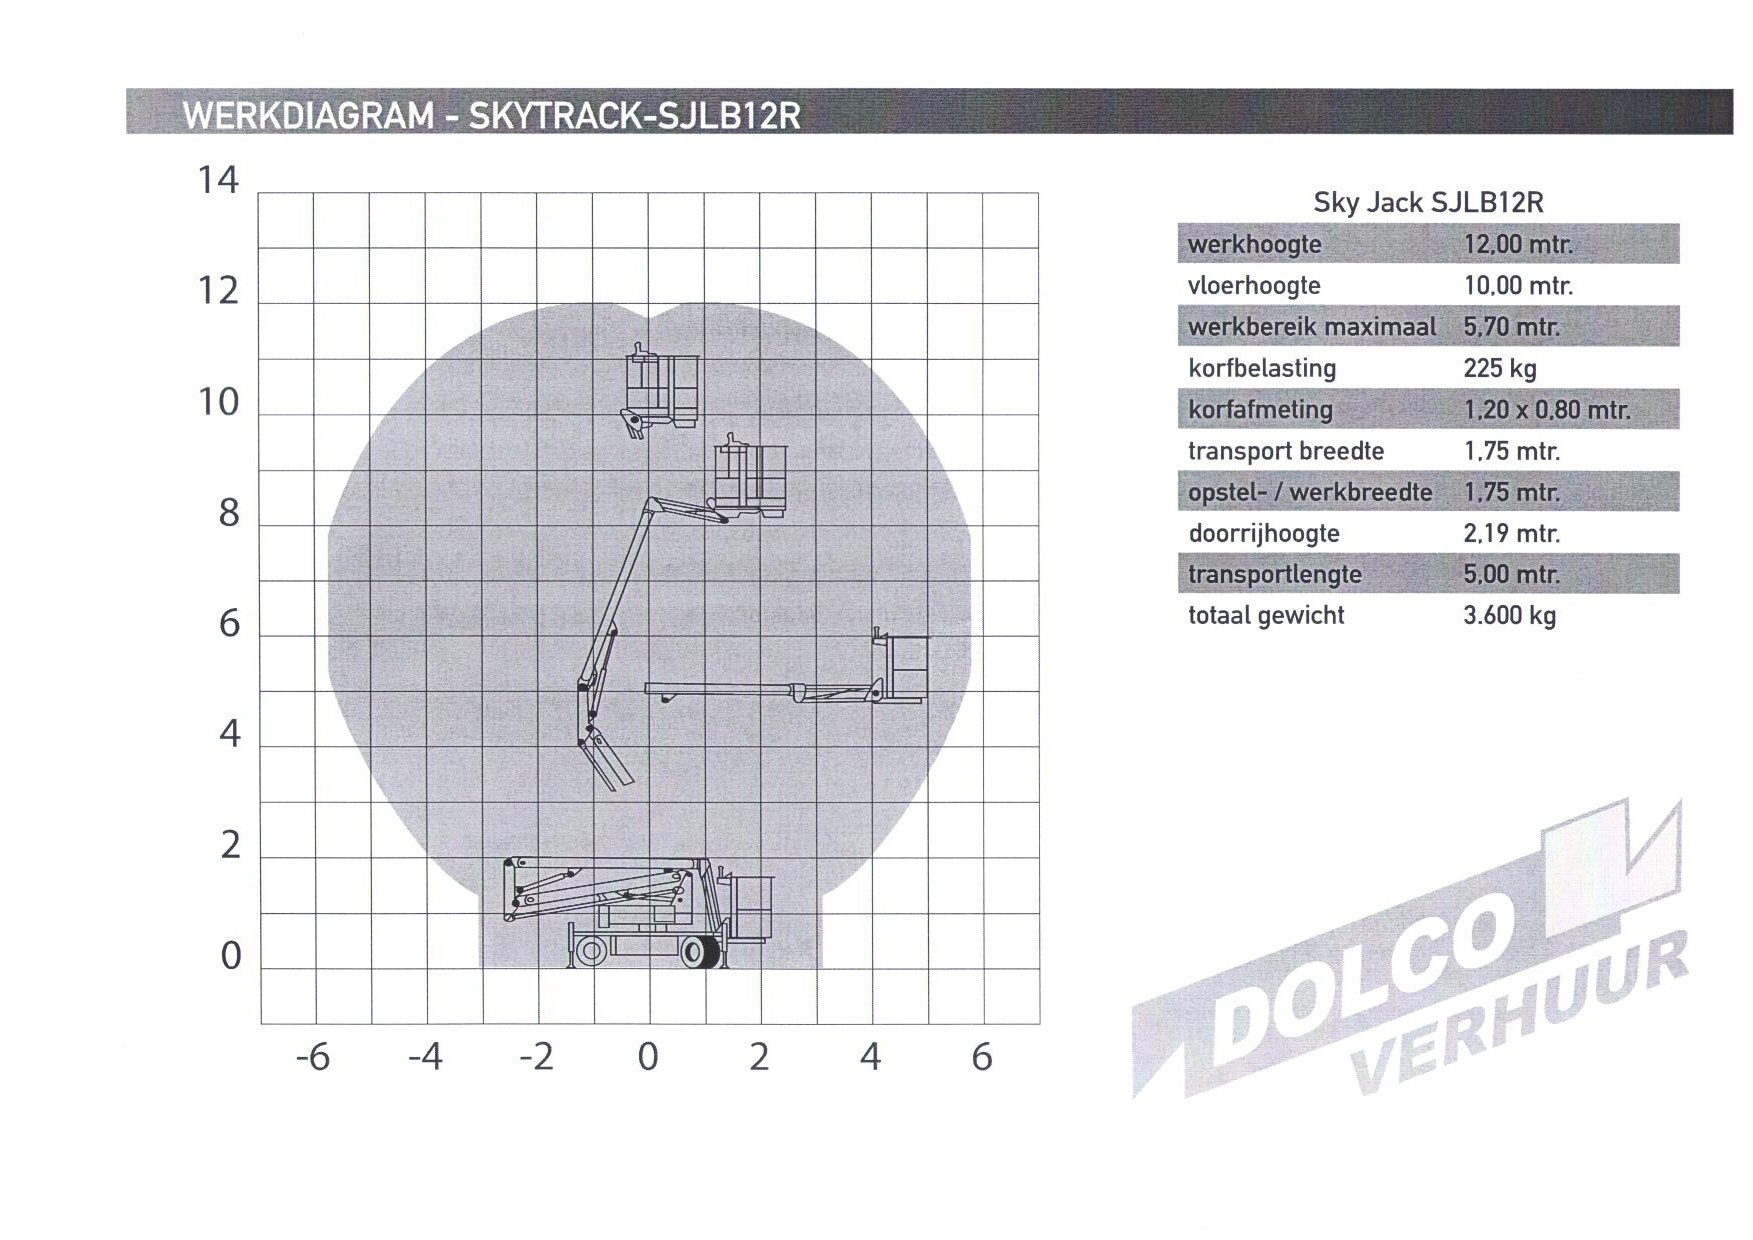 Diagram-Skytrack-SJLB12R